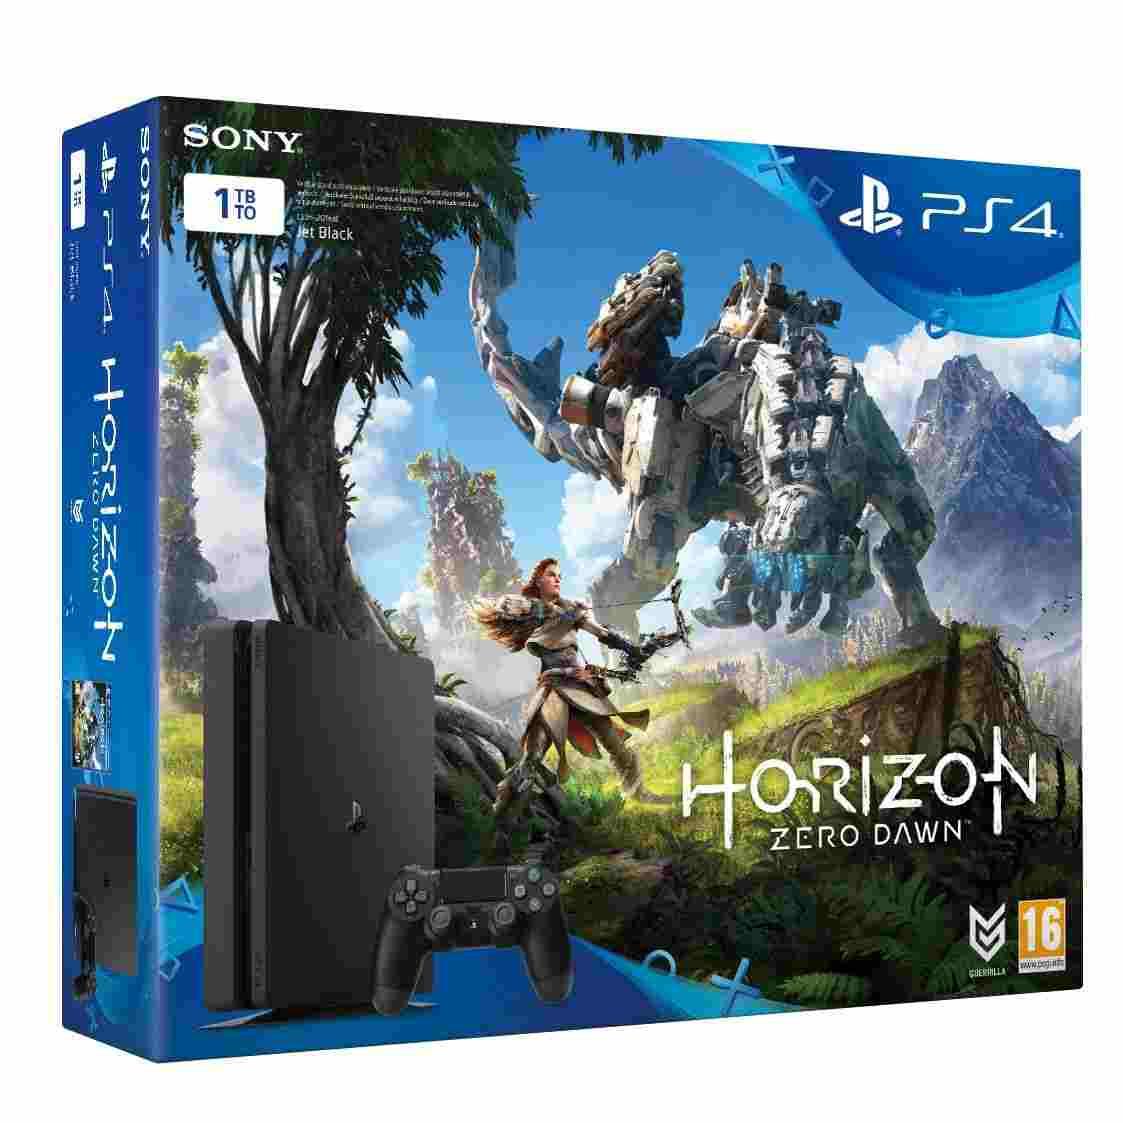 SONY PlayStation 4 Slim - 1TB + Horizon: Zero Dawn